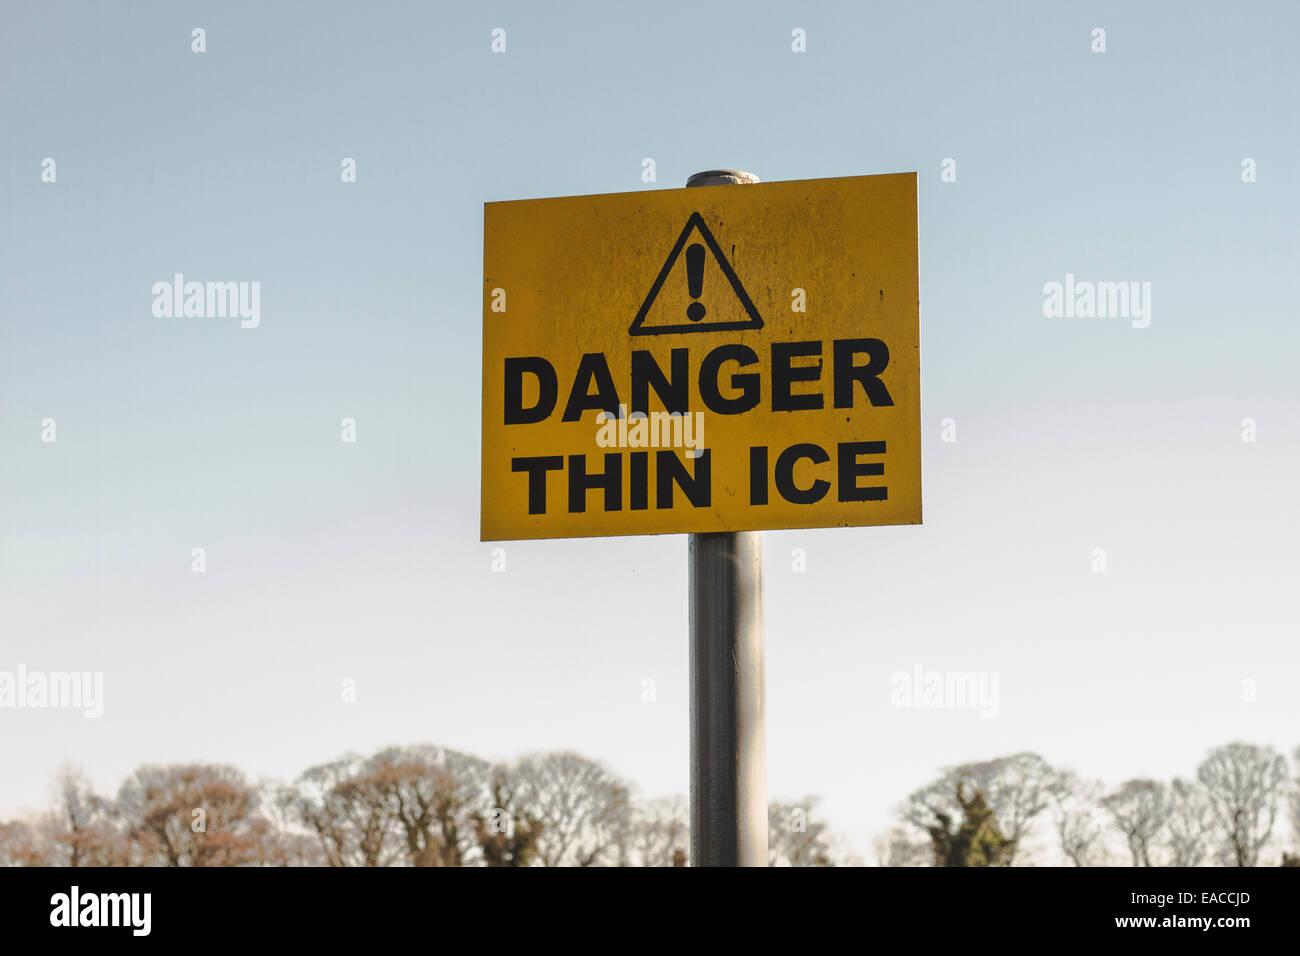 Danger Thin Ice Warning Sign - Stock Image